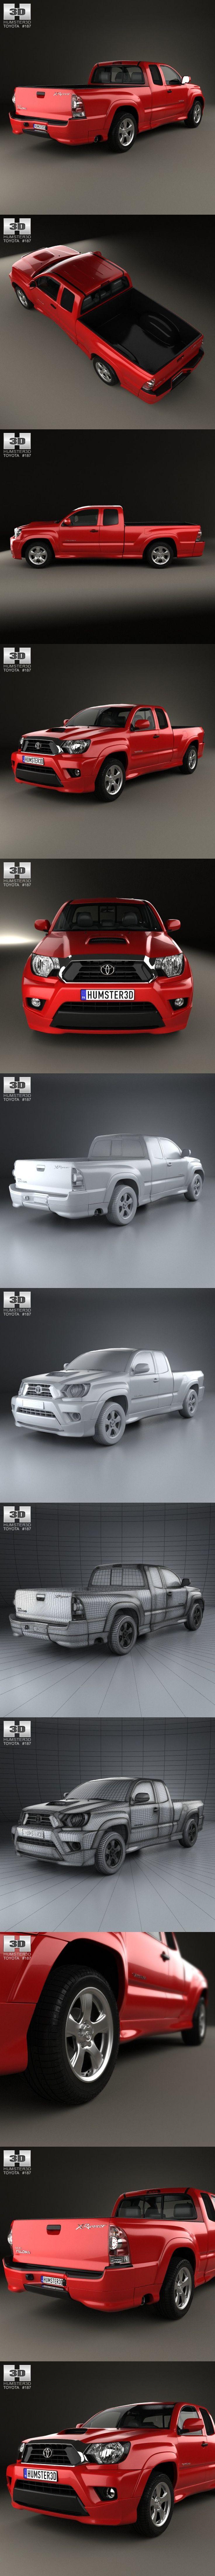 Toyota Tacoma X-Runner 2012